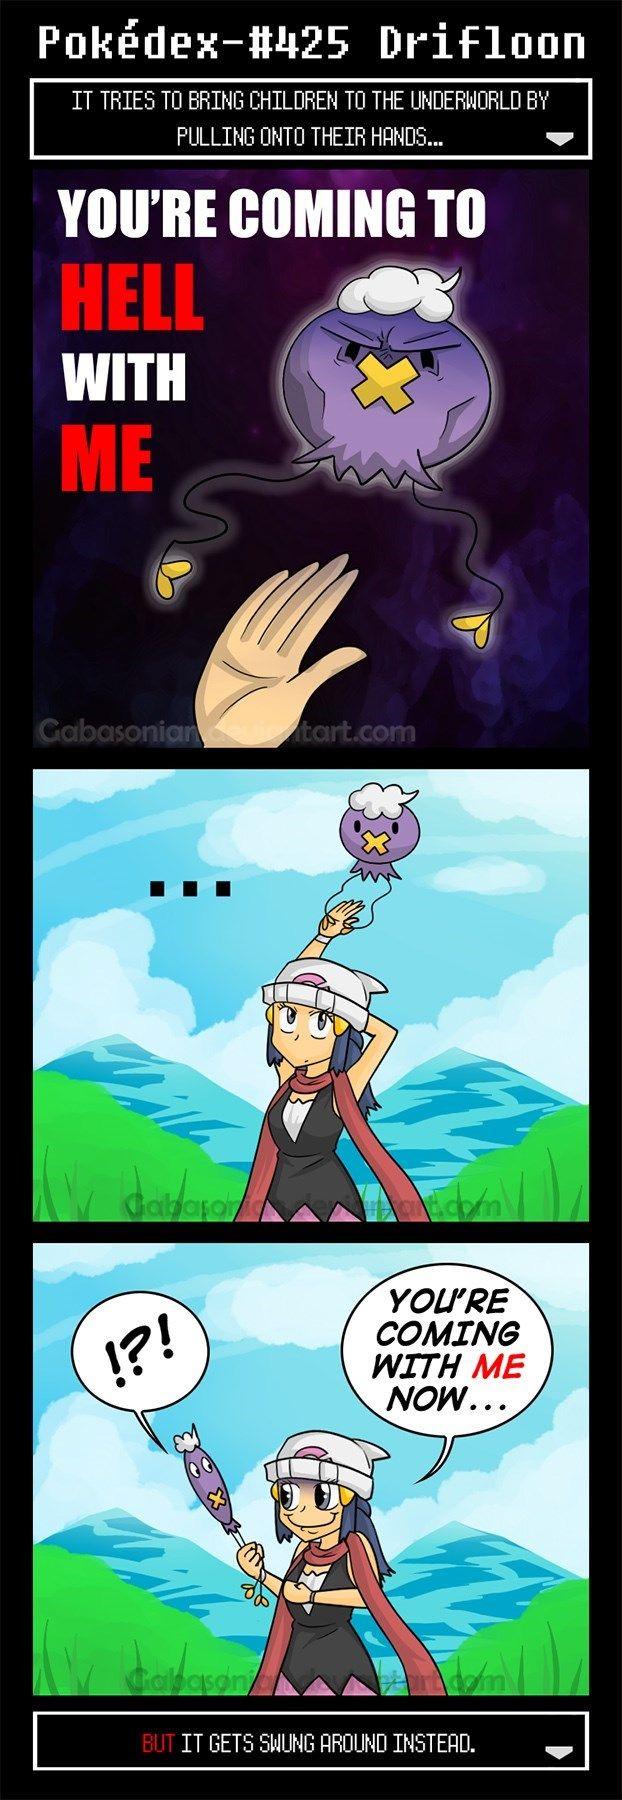 Pokémemes Video games funny, Pokemon, Pokemon art